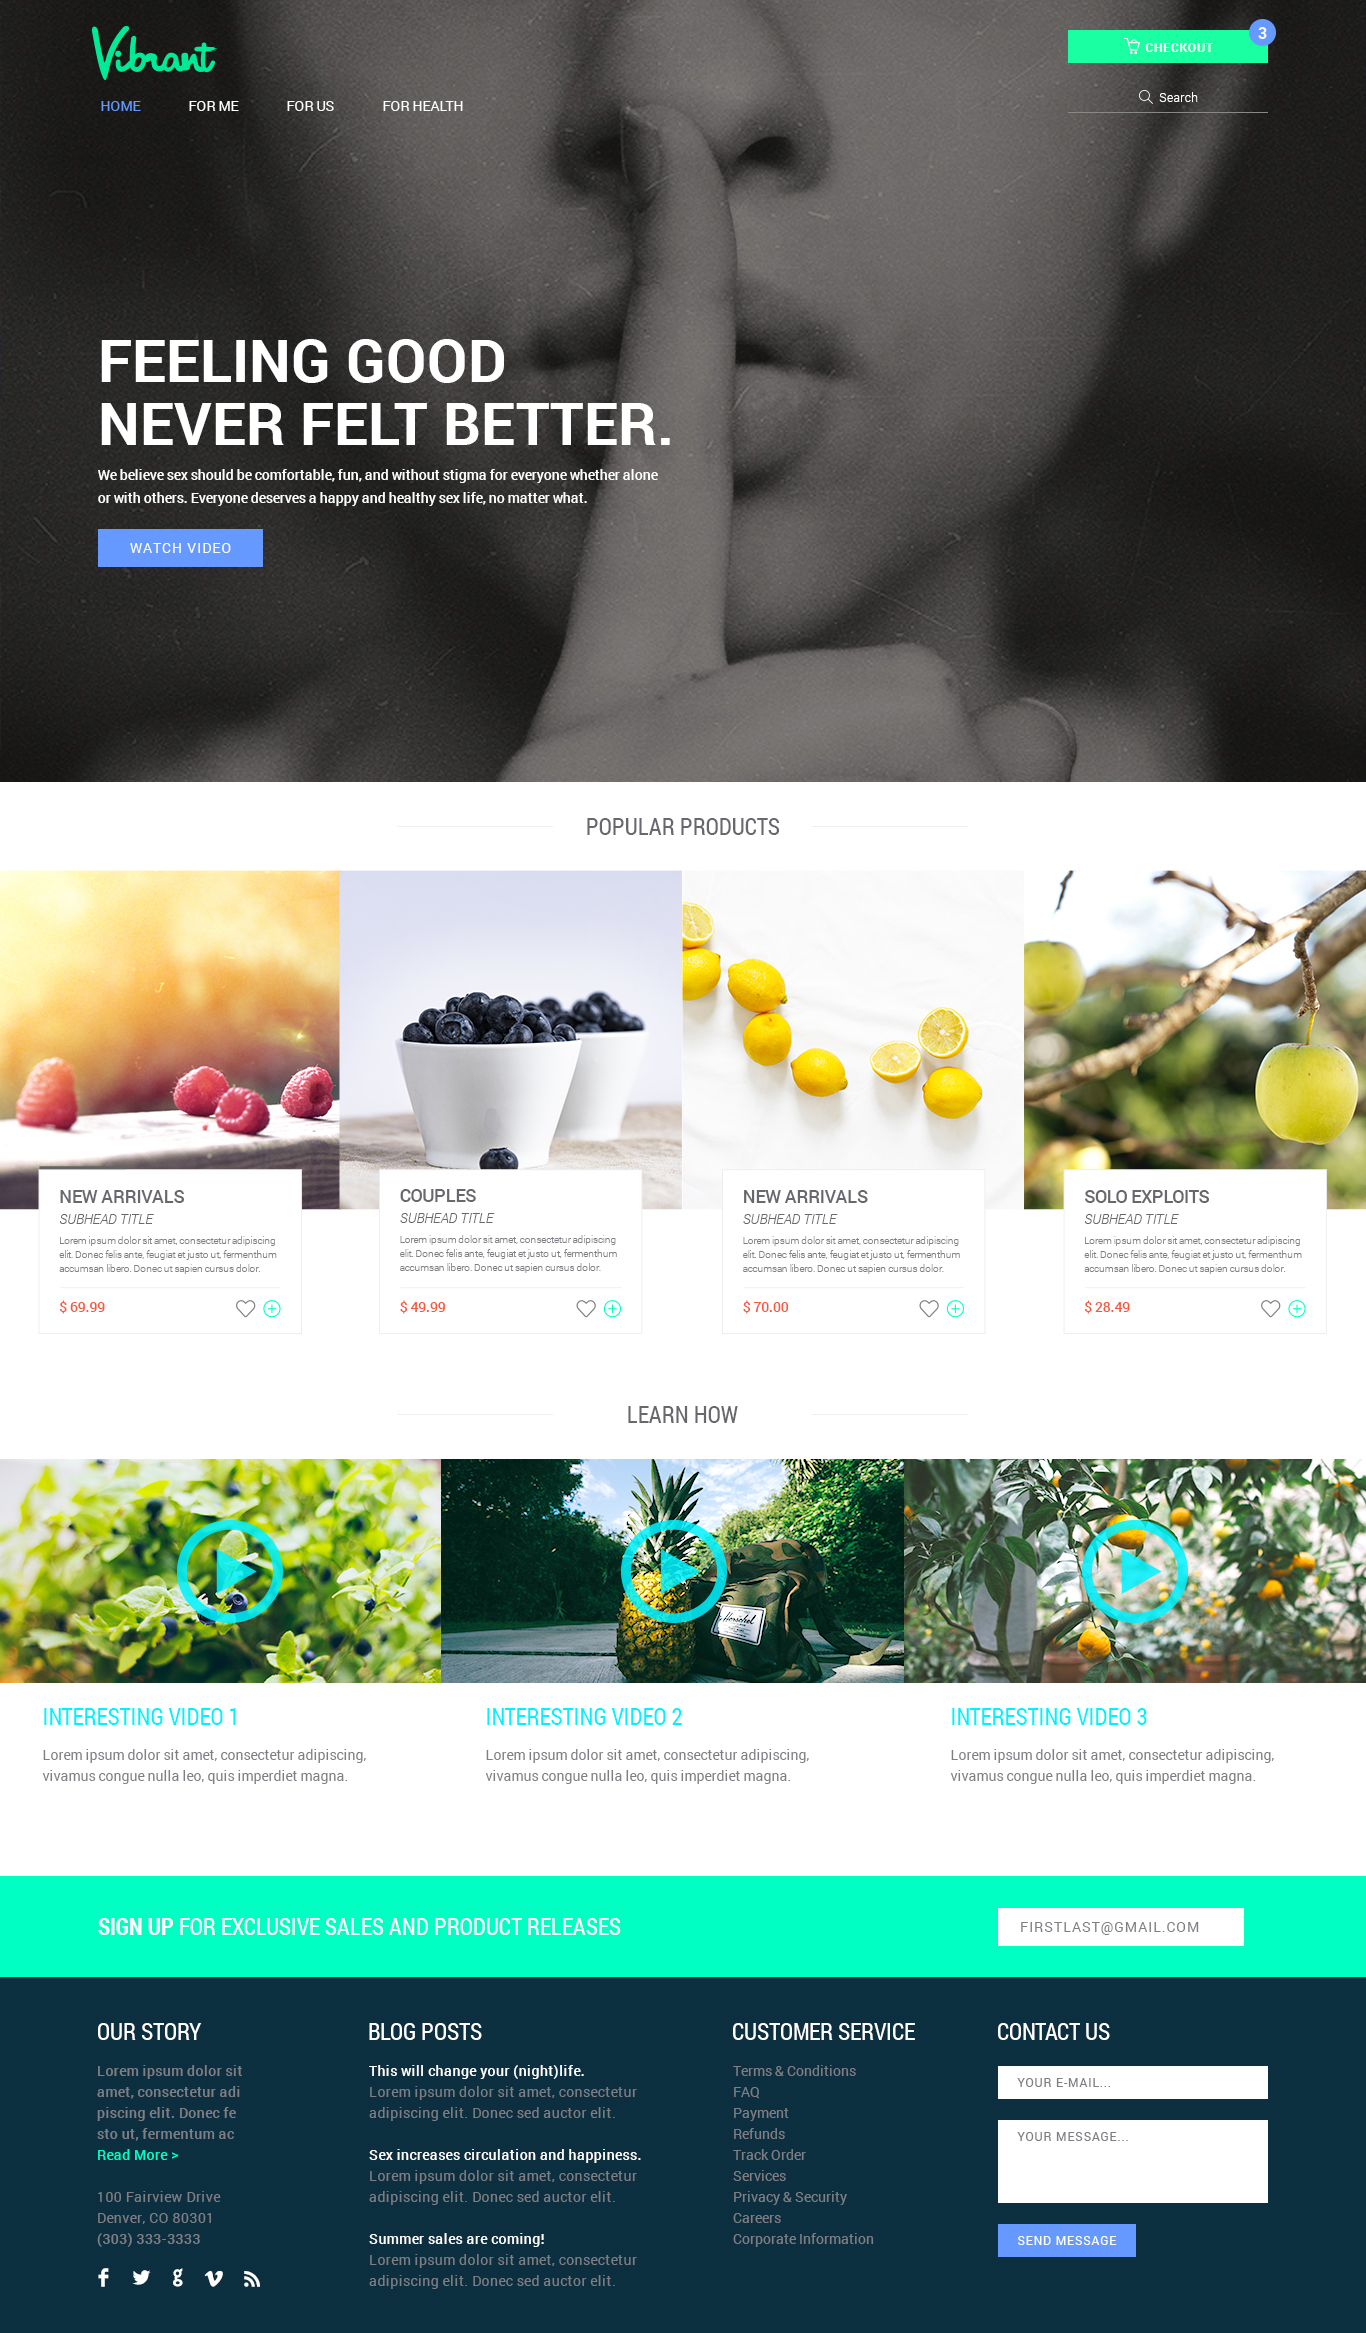 Vibrant_Homepage_B_new_logo_new_image.jpg